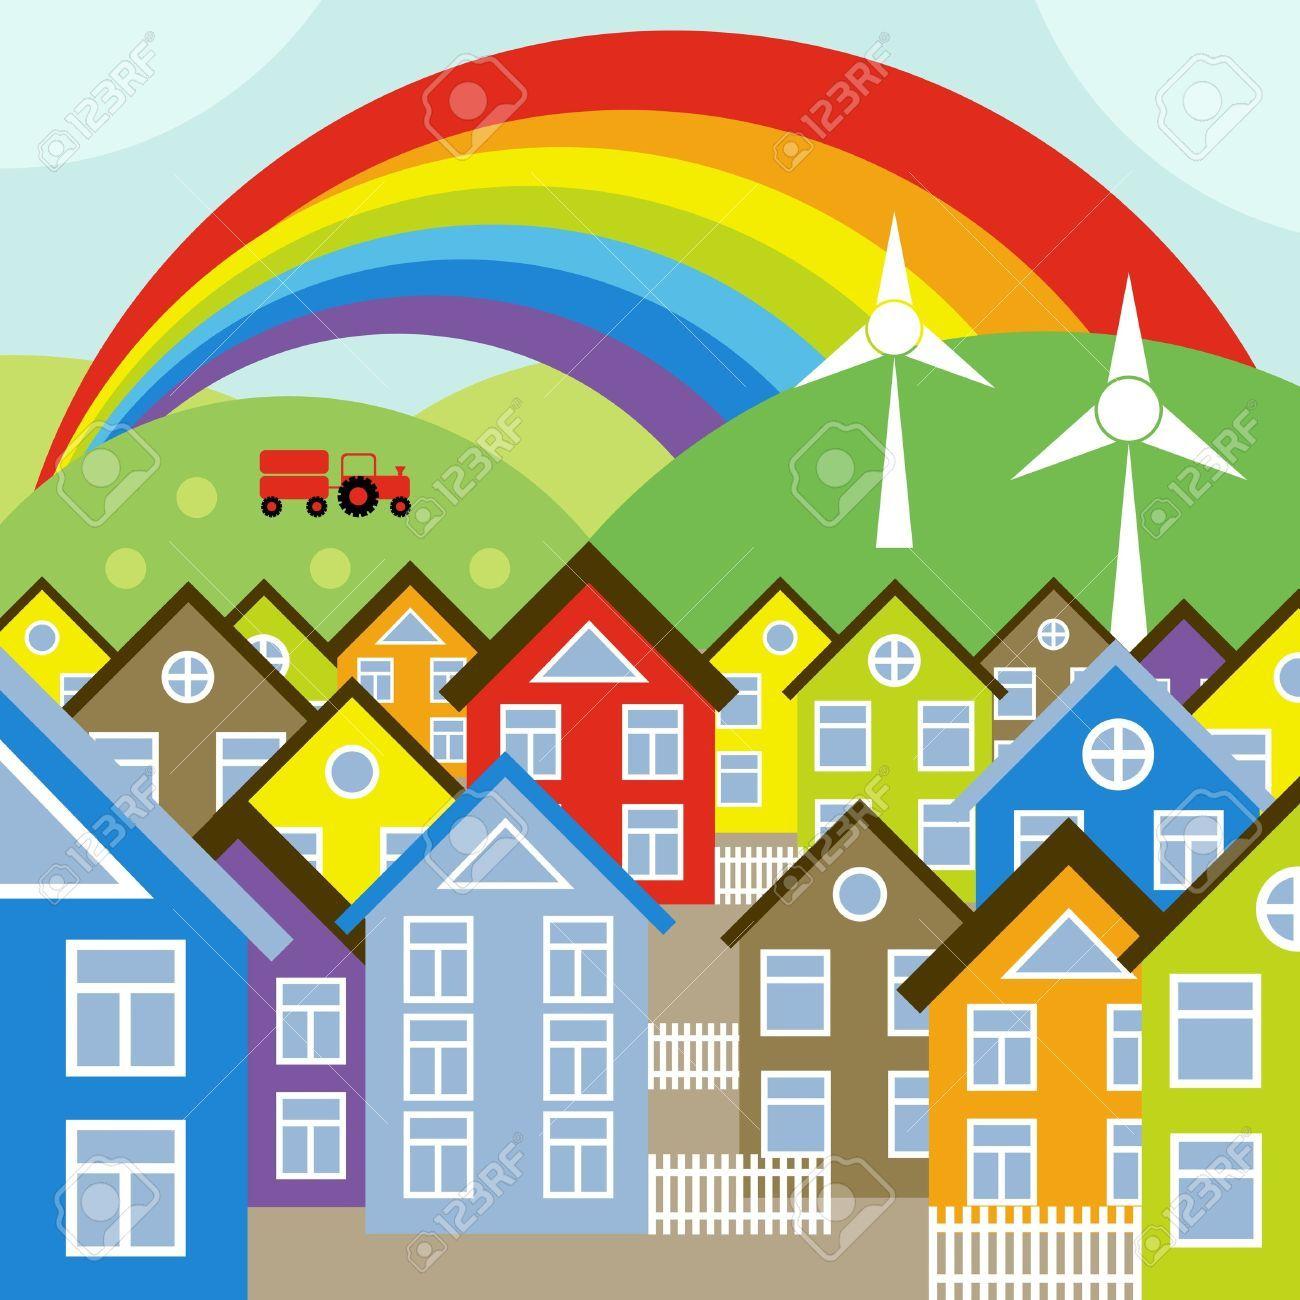 medium resolution of neighborhood street cliparts stock vector and royalty free